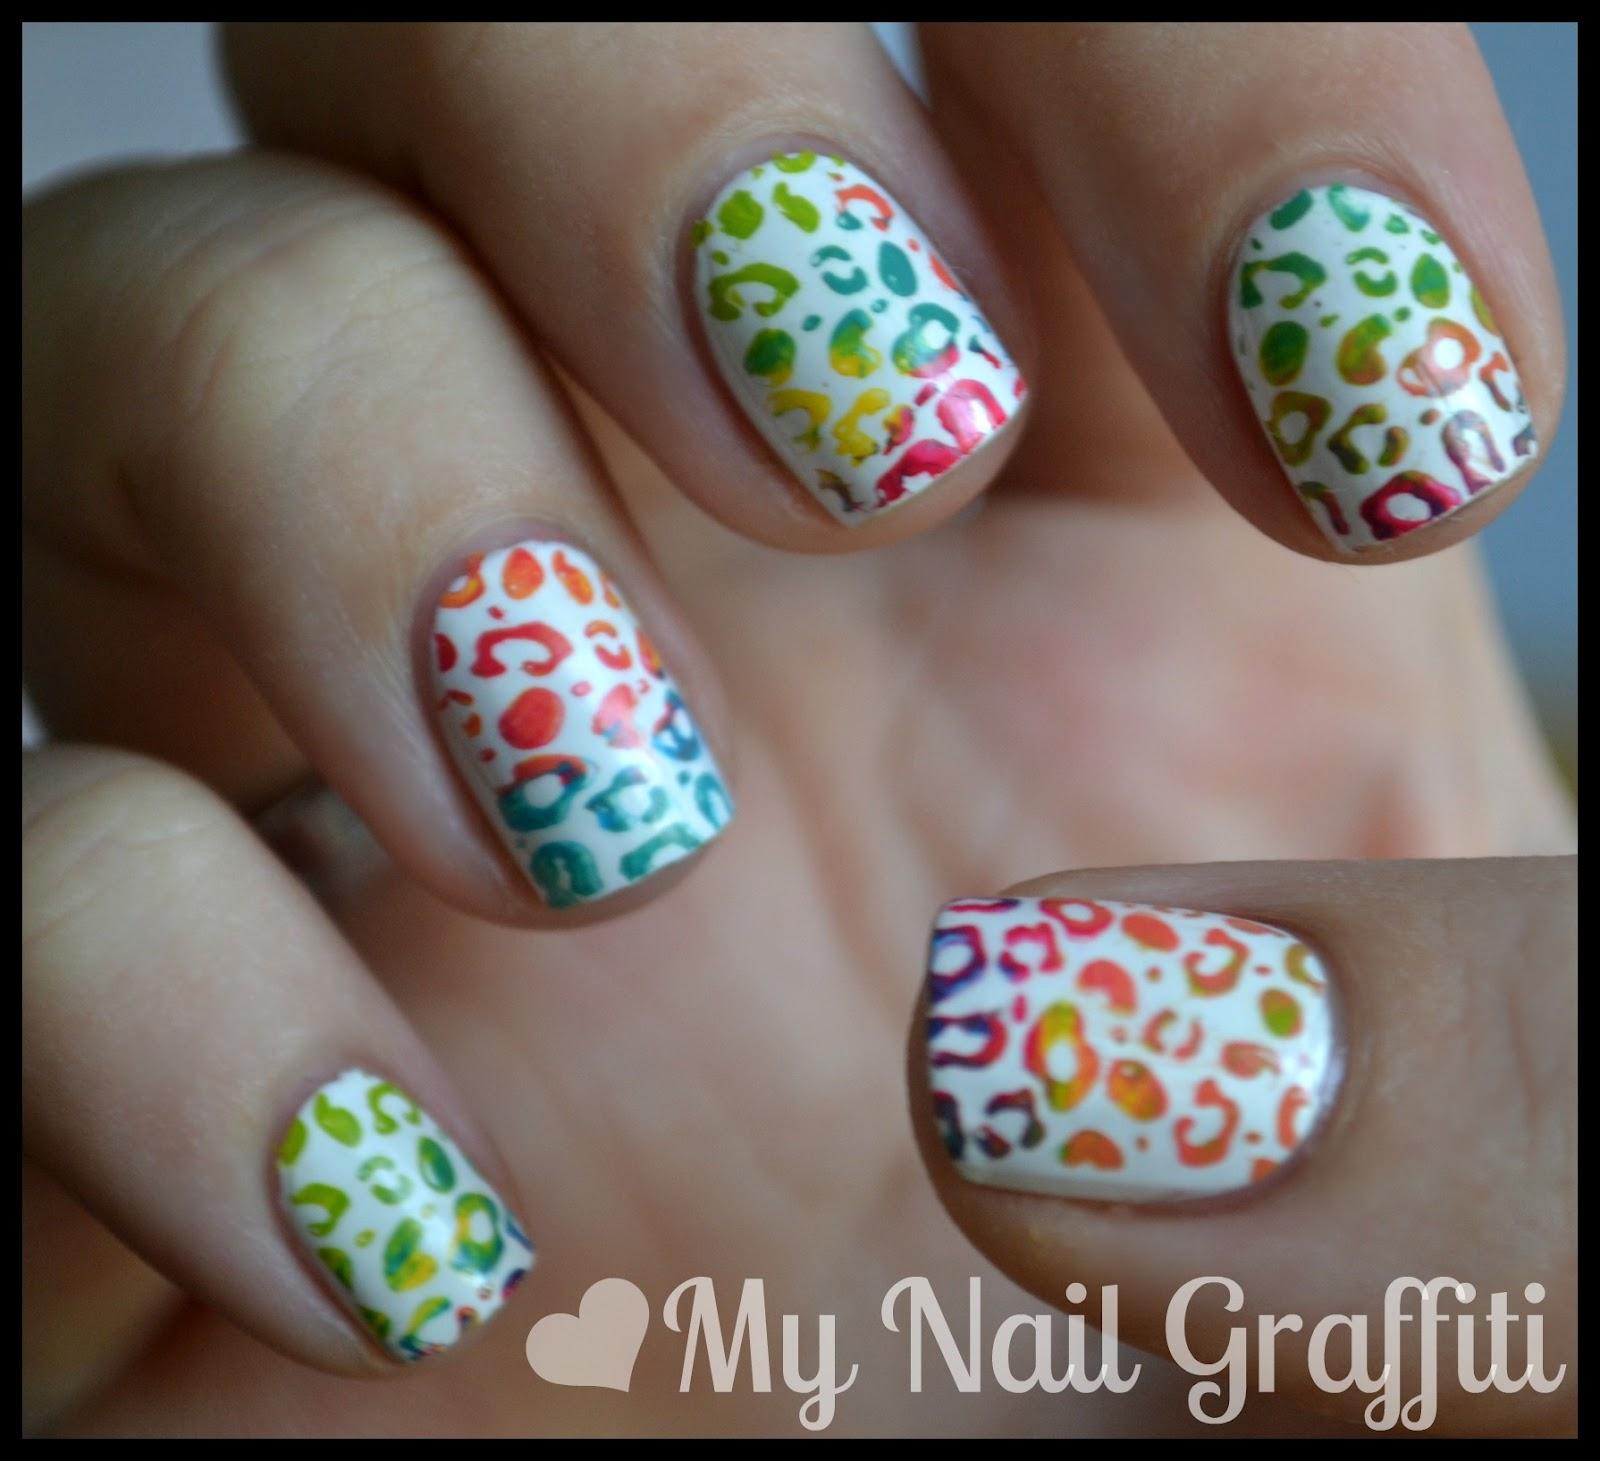 My Nail Graffiti: Multi Colored Leopard Nail Art